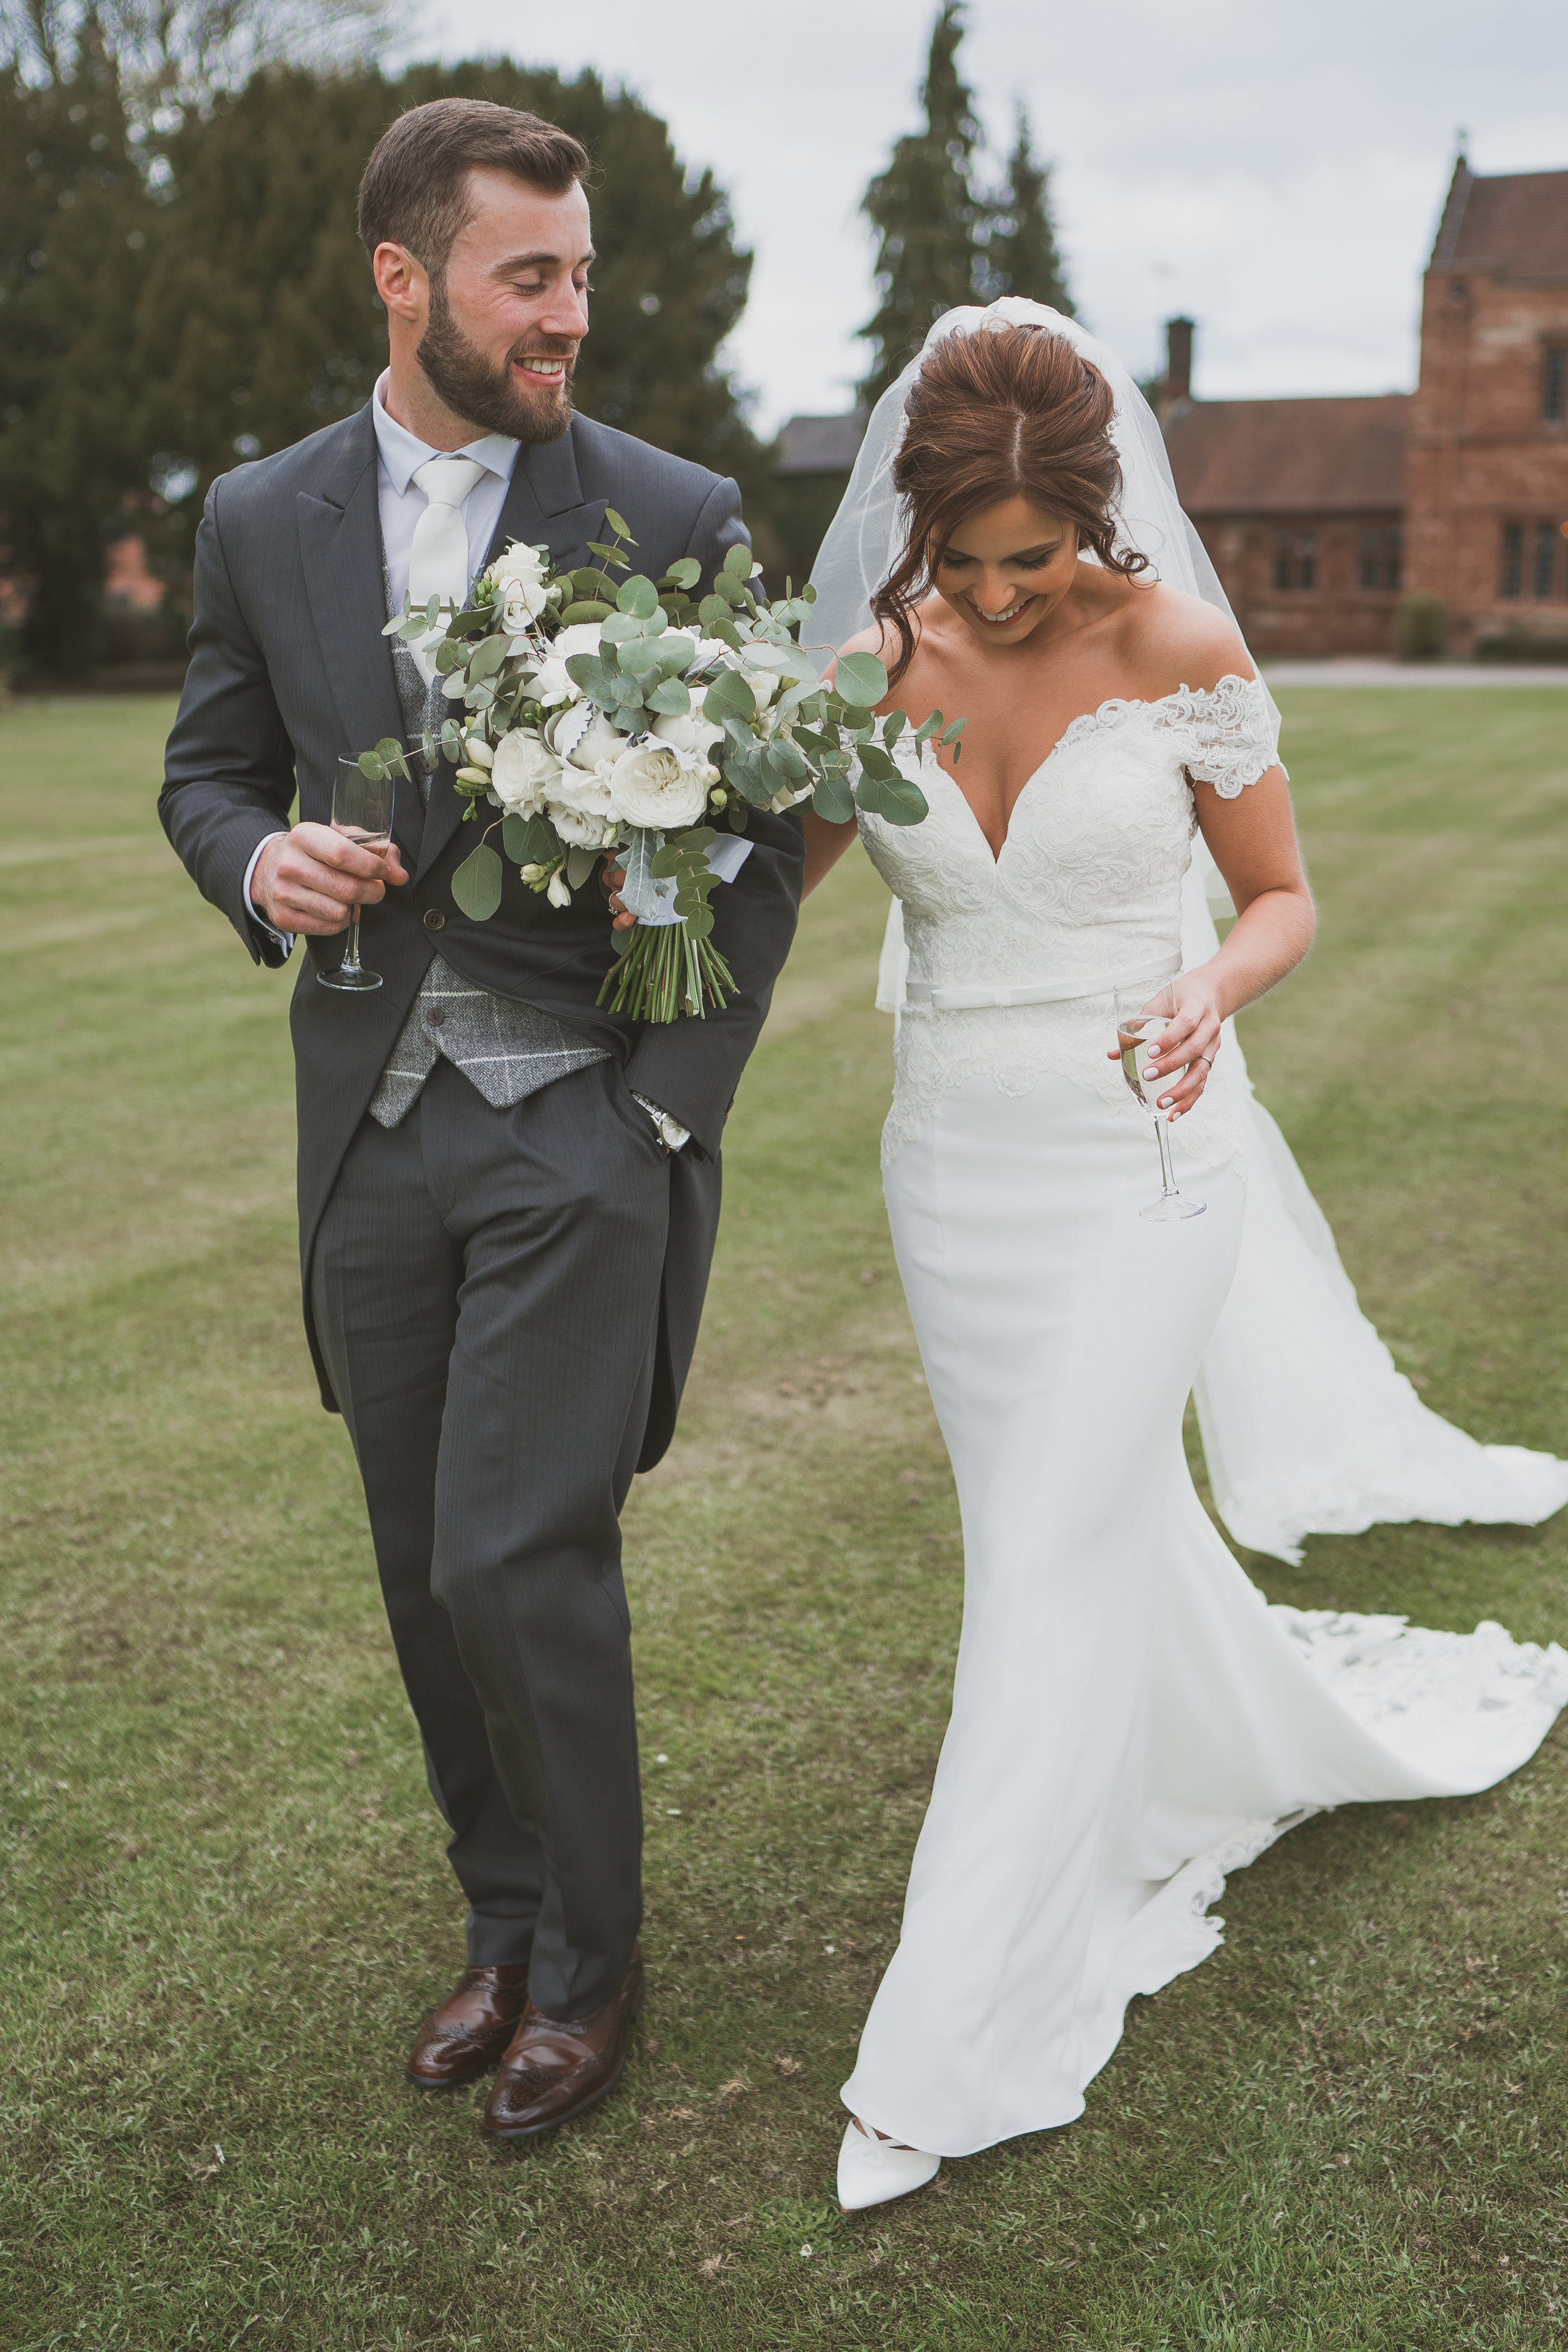 wedding venues in cheshire.jpg